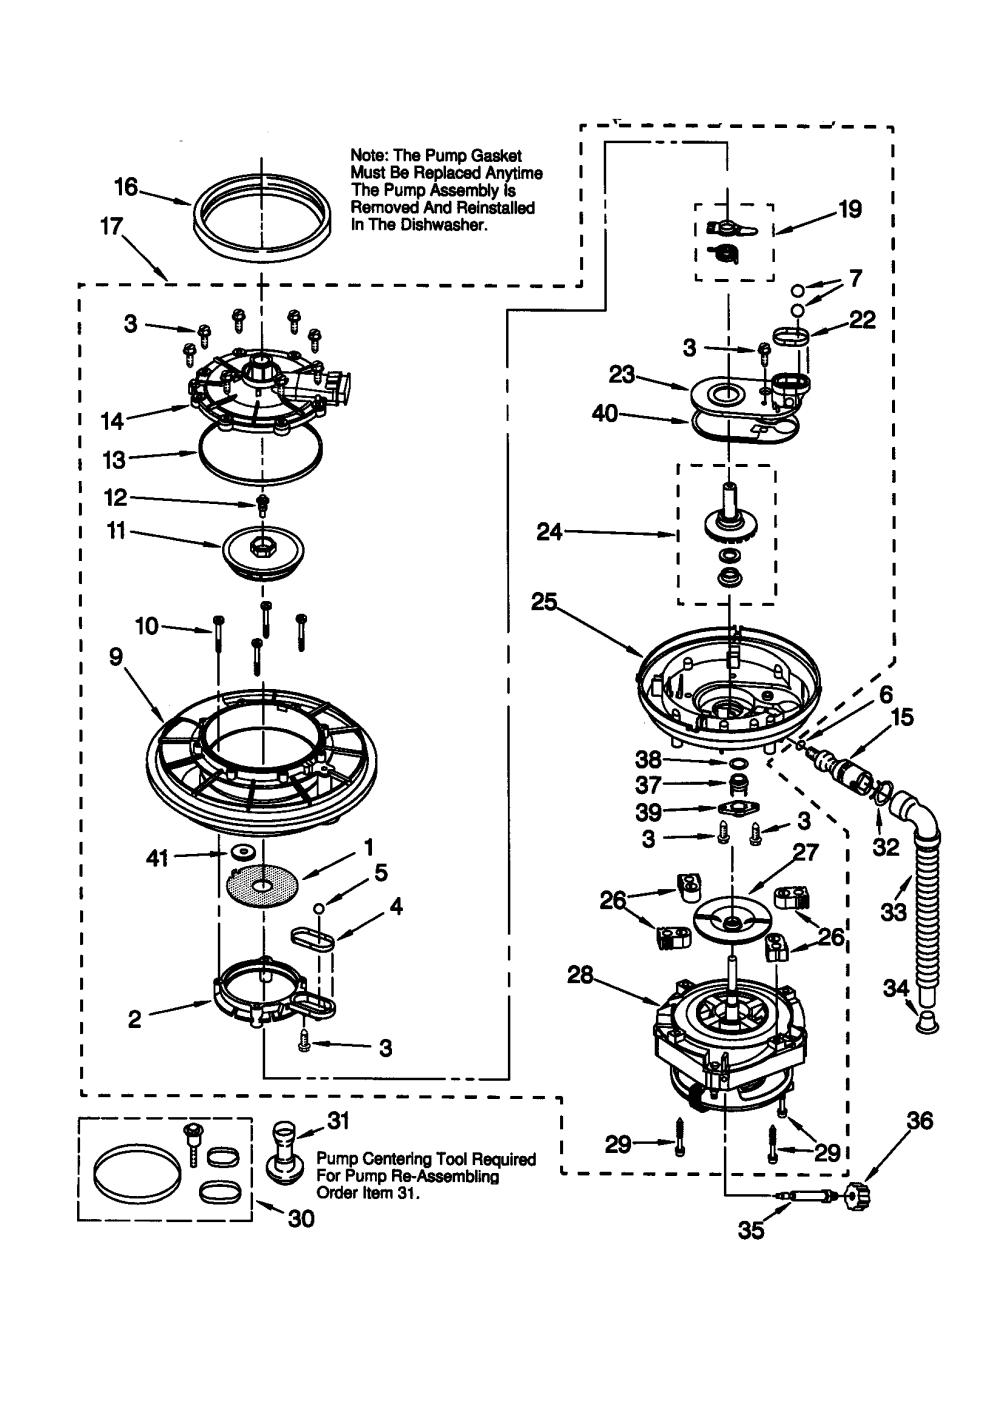 medium resolution of 66515982990 dishwasher pump and motor parts diagram